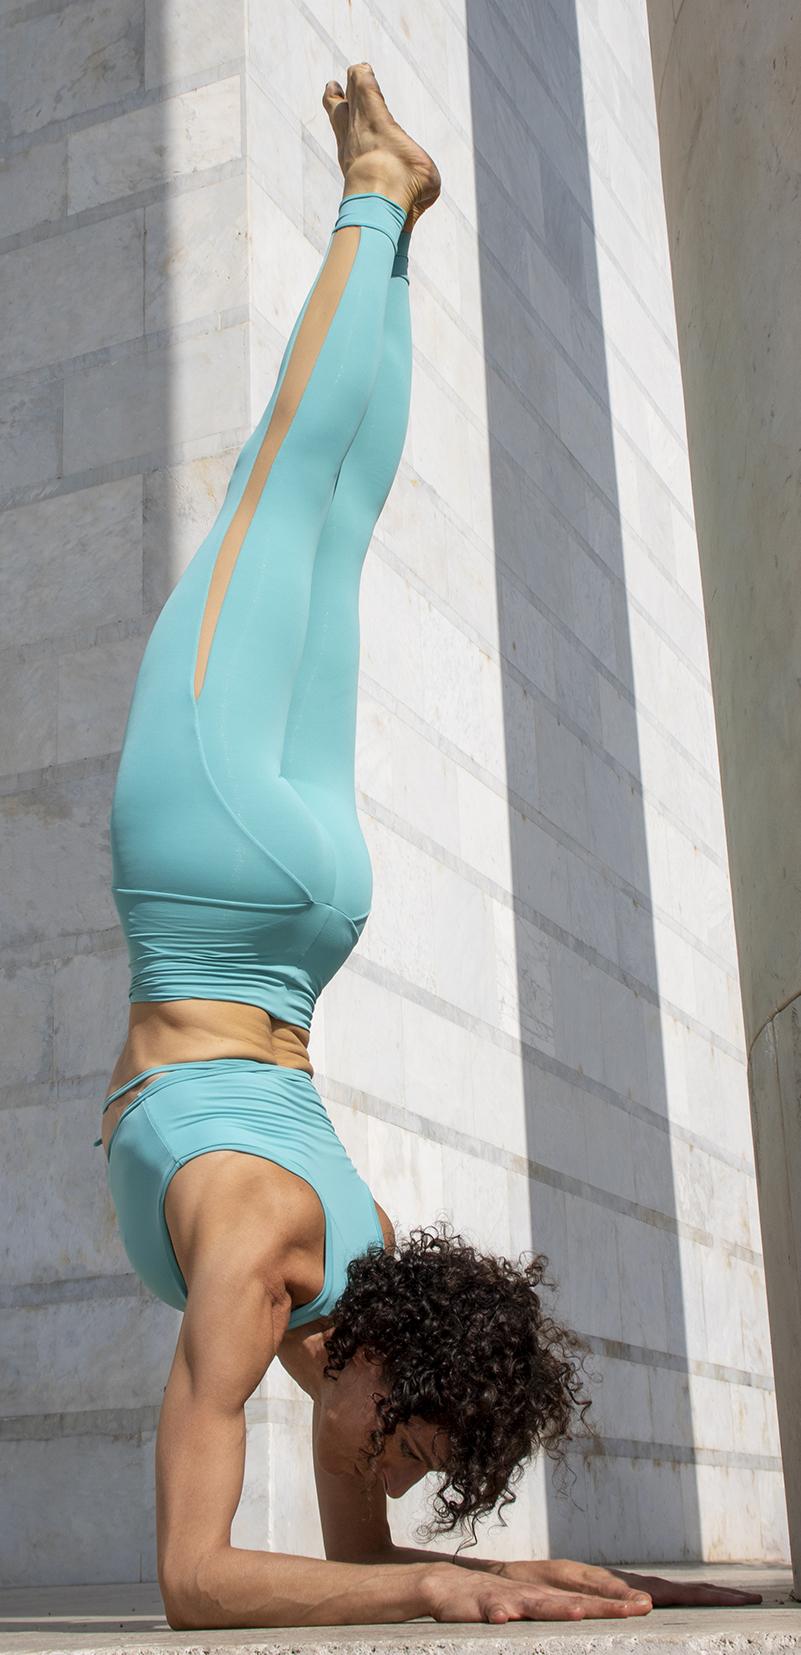 Completo Yoga Top Vega Leggings Olimpia Acqua